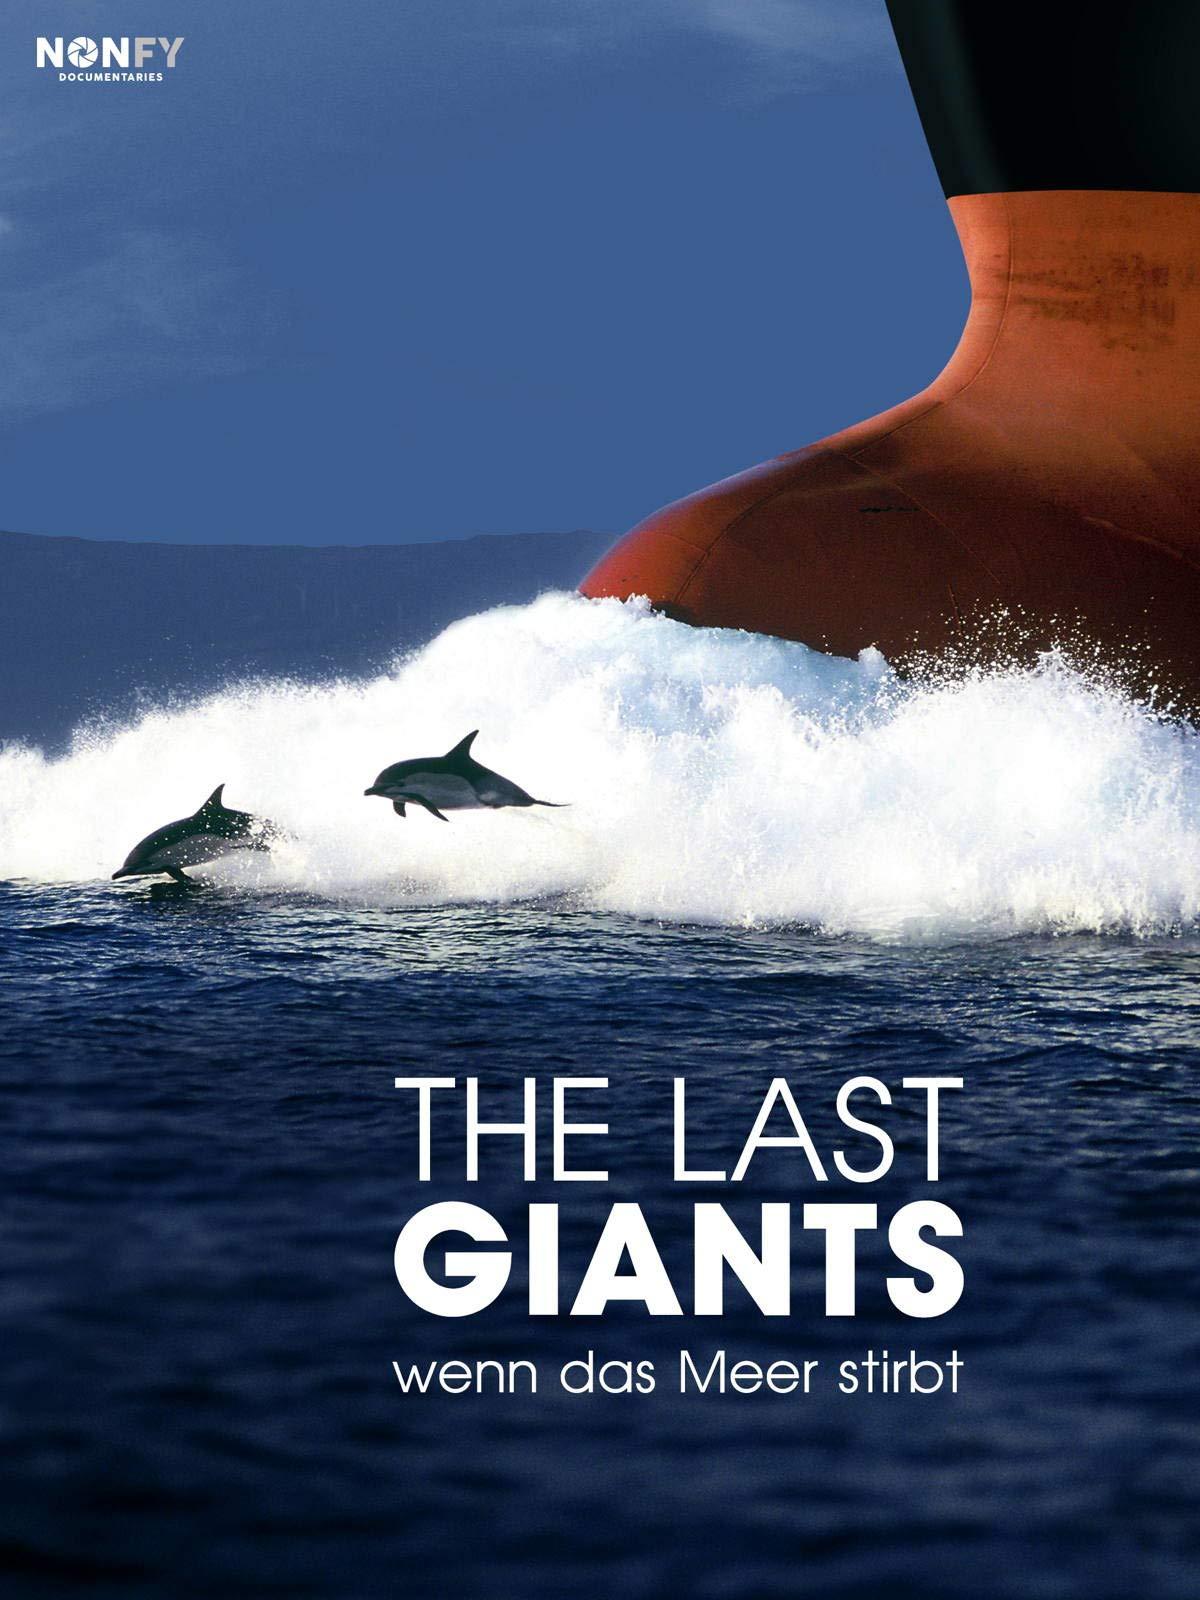 The Last Giants - Wenn das Meer stirbt